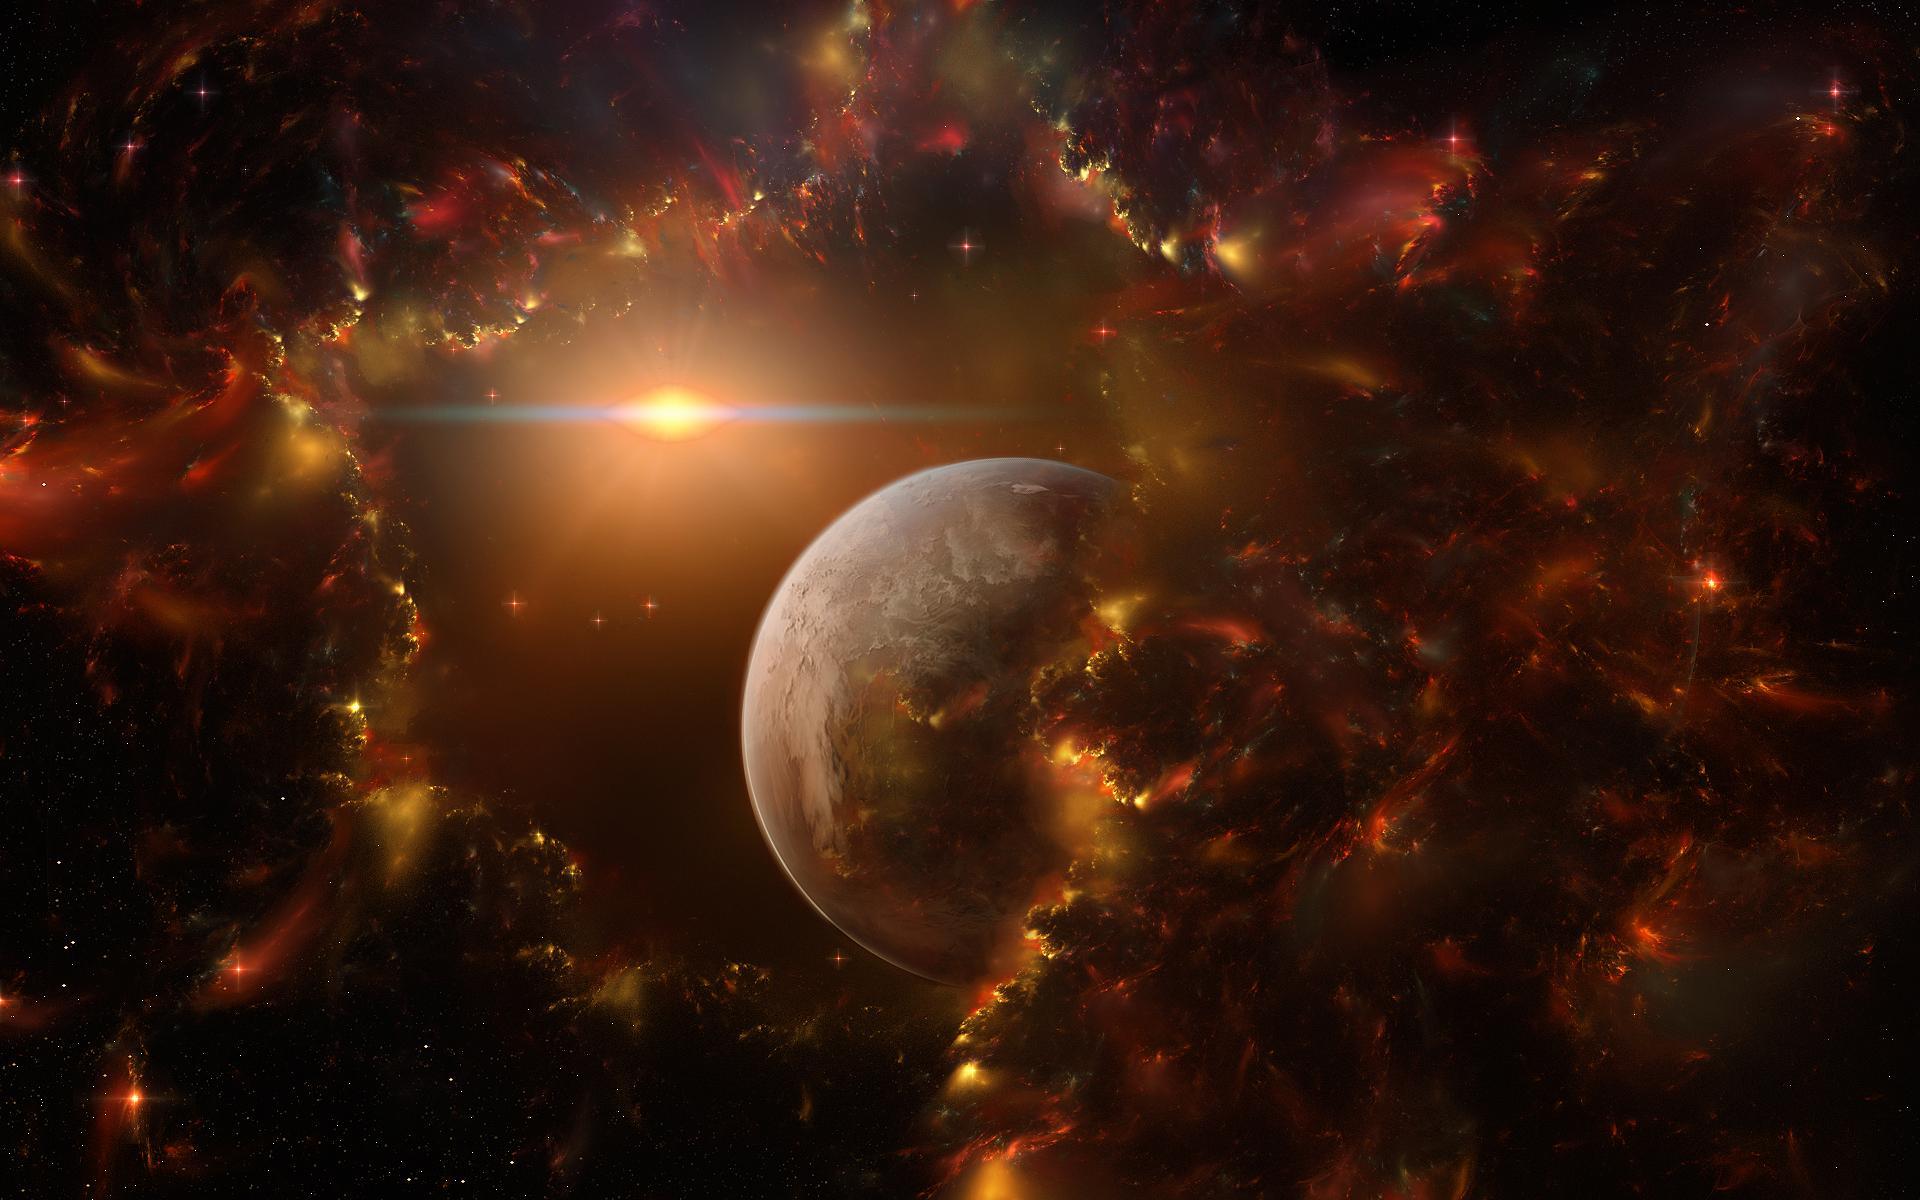 Космос фантастика космос звезды